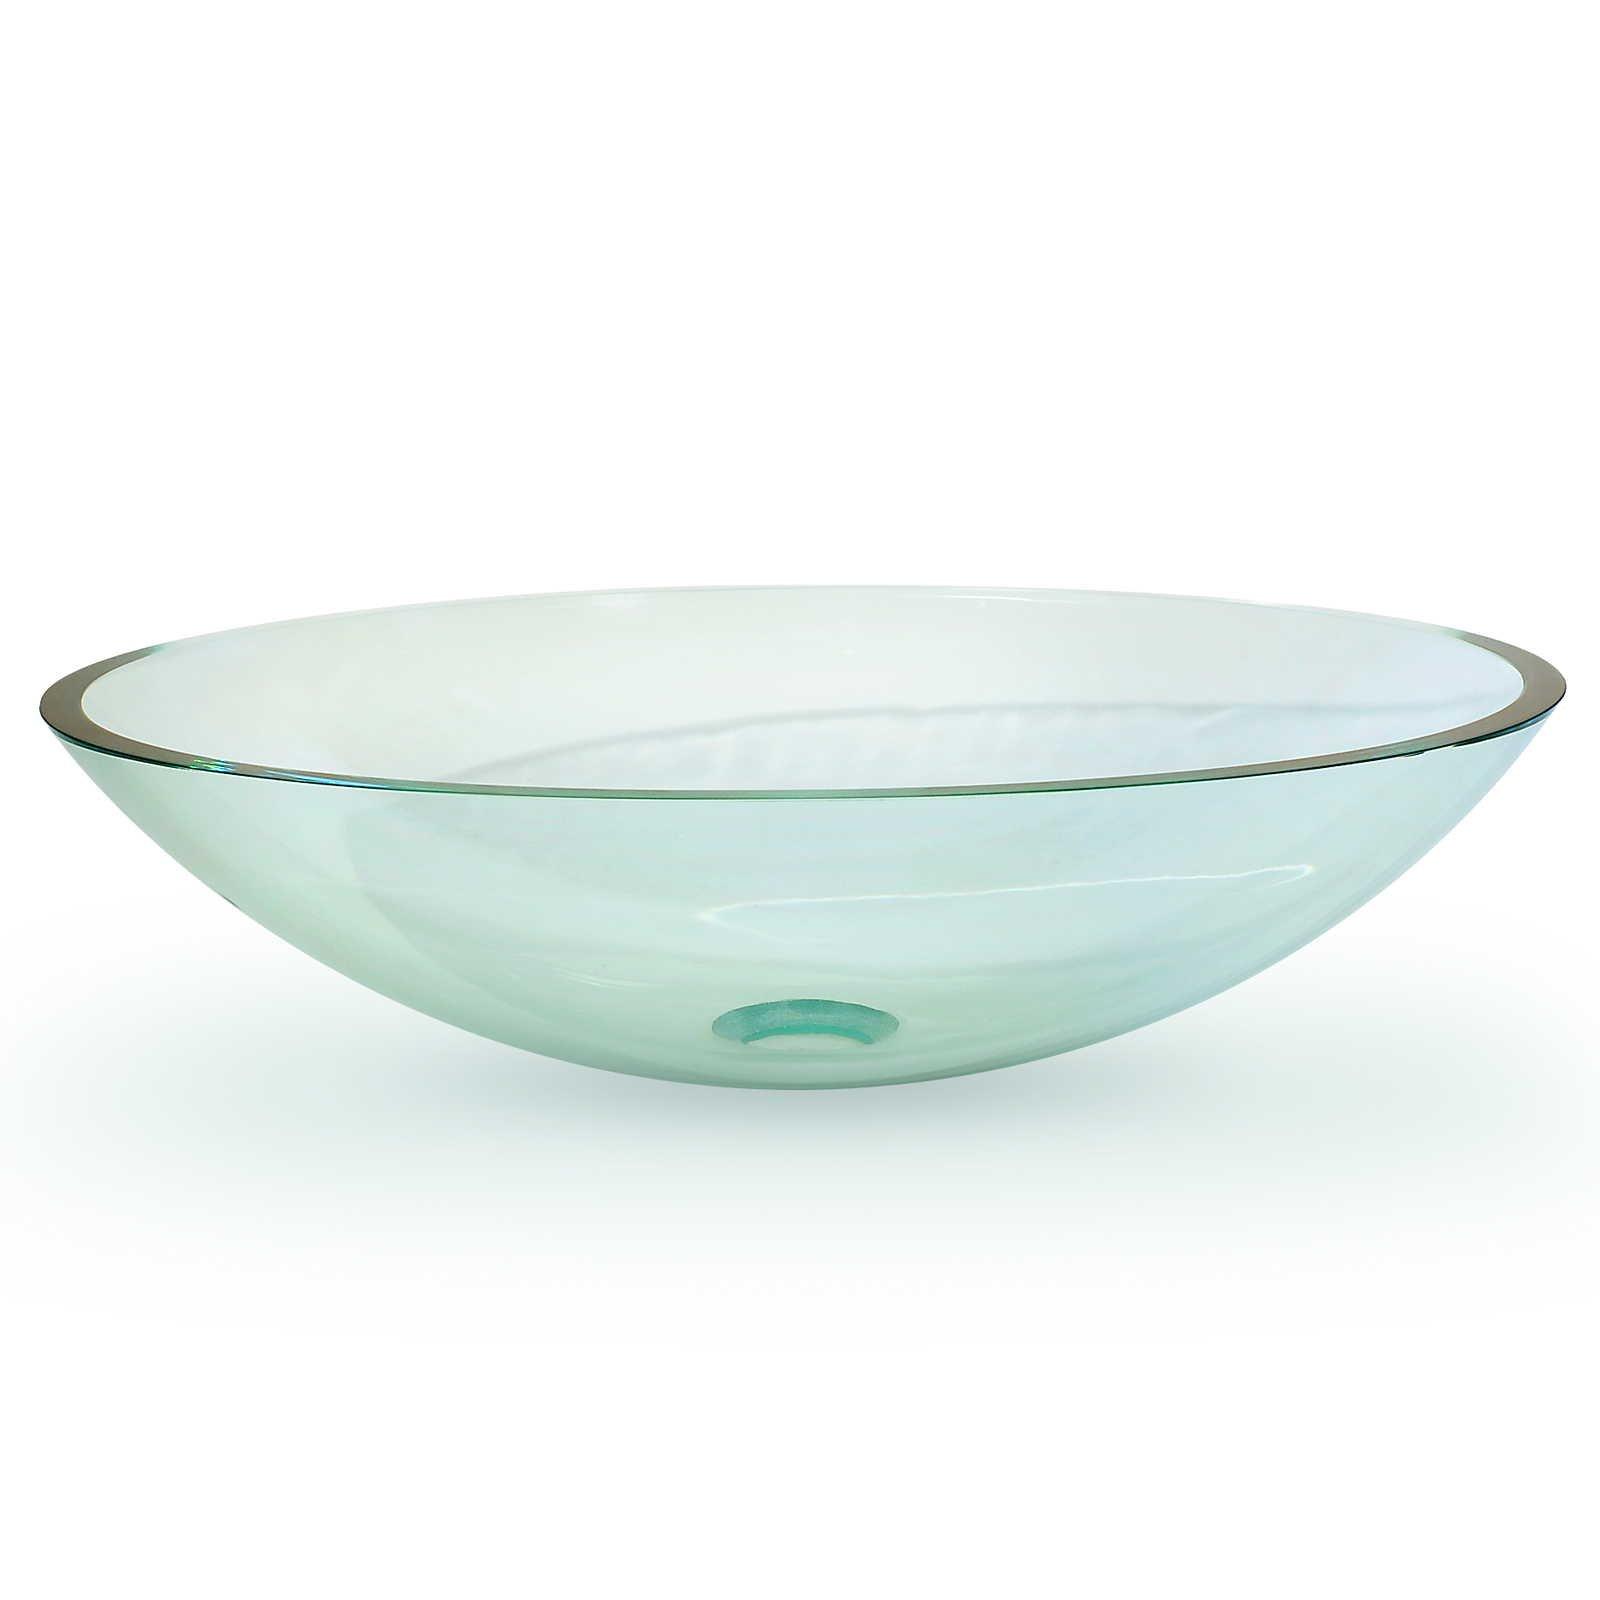 Miligoré Modern Glass Vessel Sink - Above Counter Bathroom Vanity Basin Bowl - Oval Clear